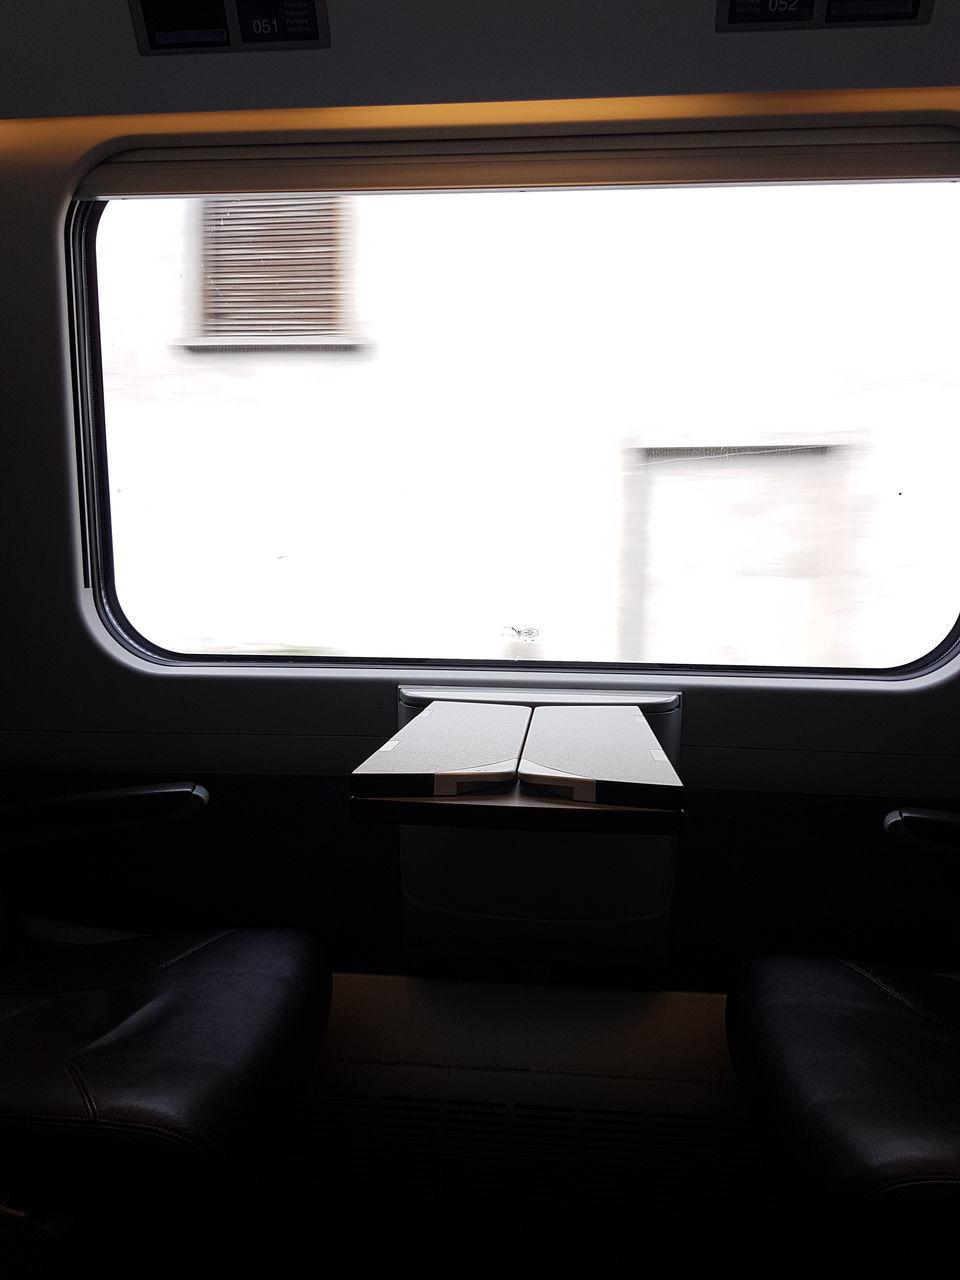 vehicle interior, transportation, window, mode of transport, public transportation, vehicle seat, no people, train - vehicle, indoors, journey, day, close-up